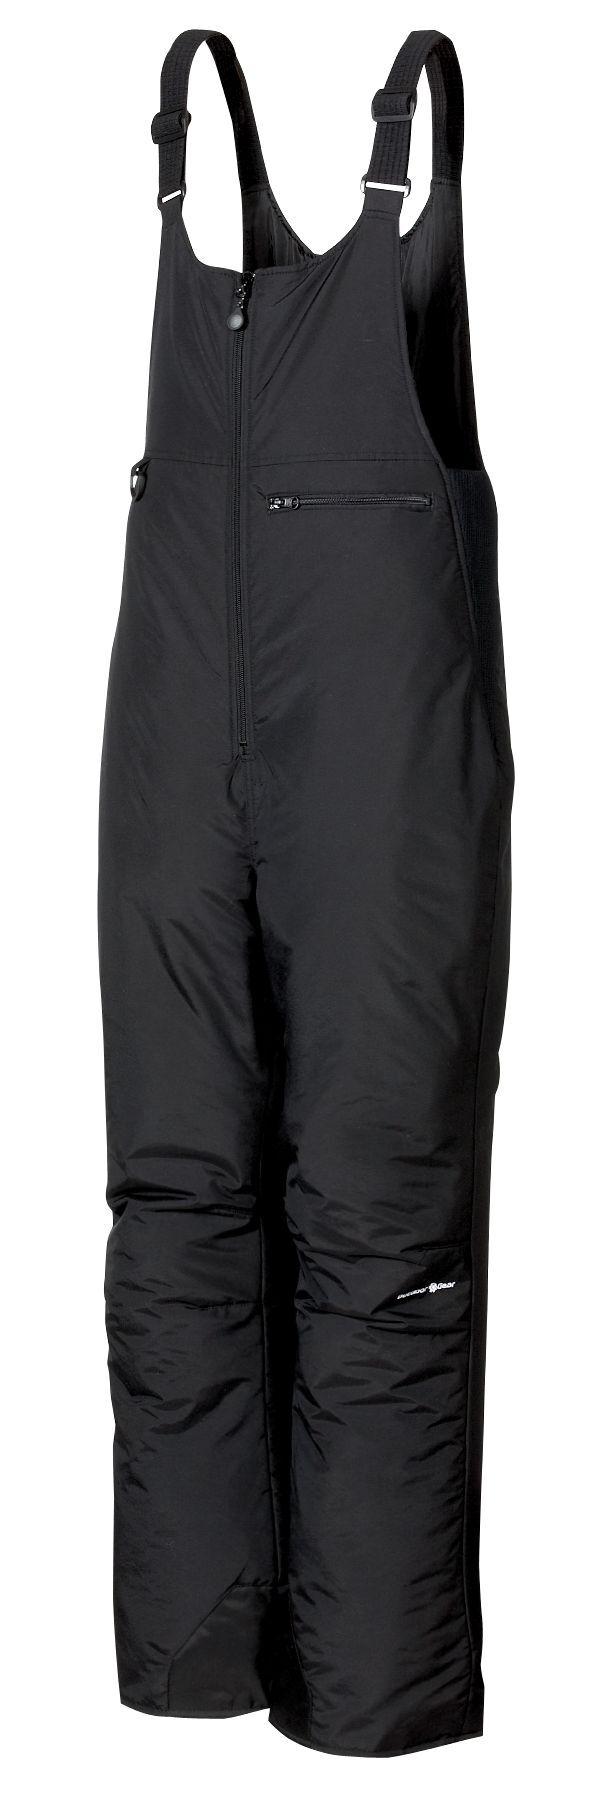 Outdoor Gear Men's Peak Bib (Regular and Big & Tall), Large, Black